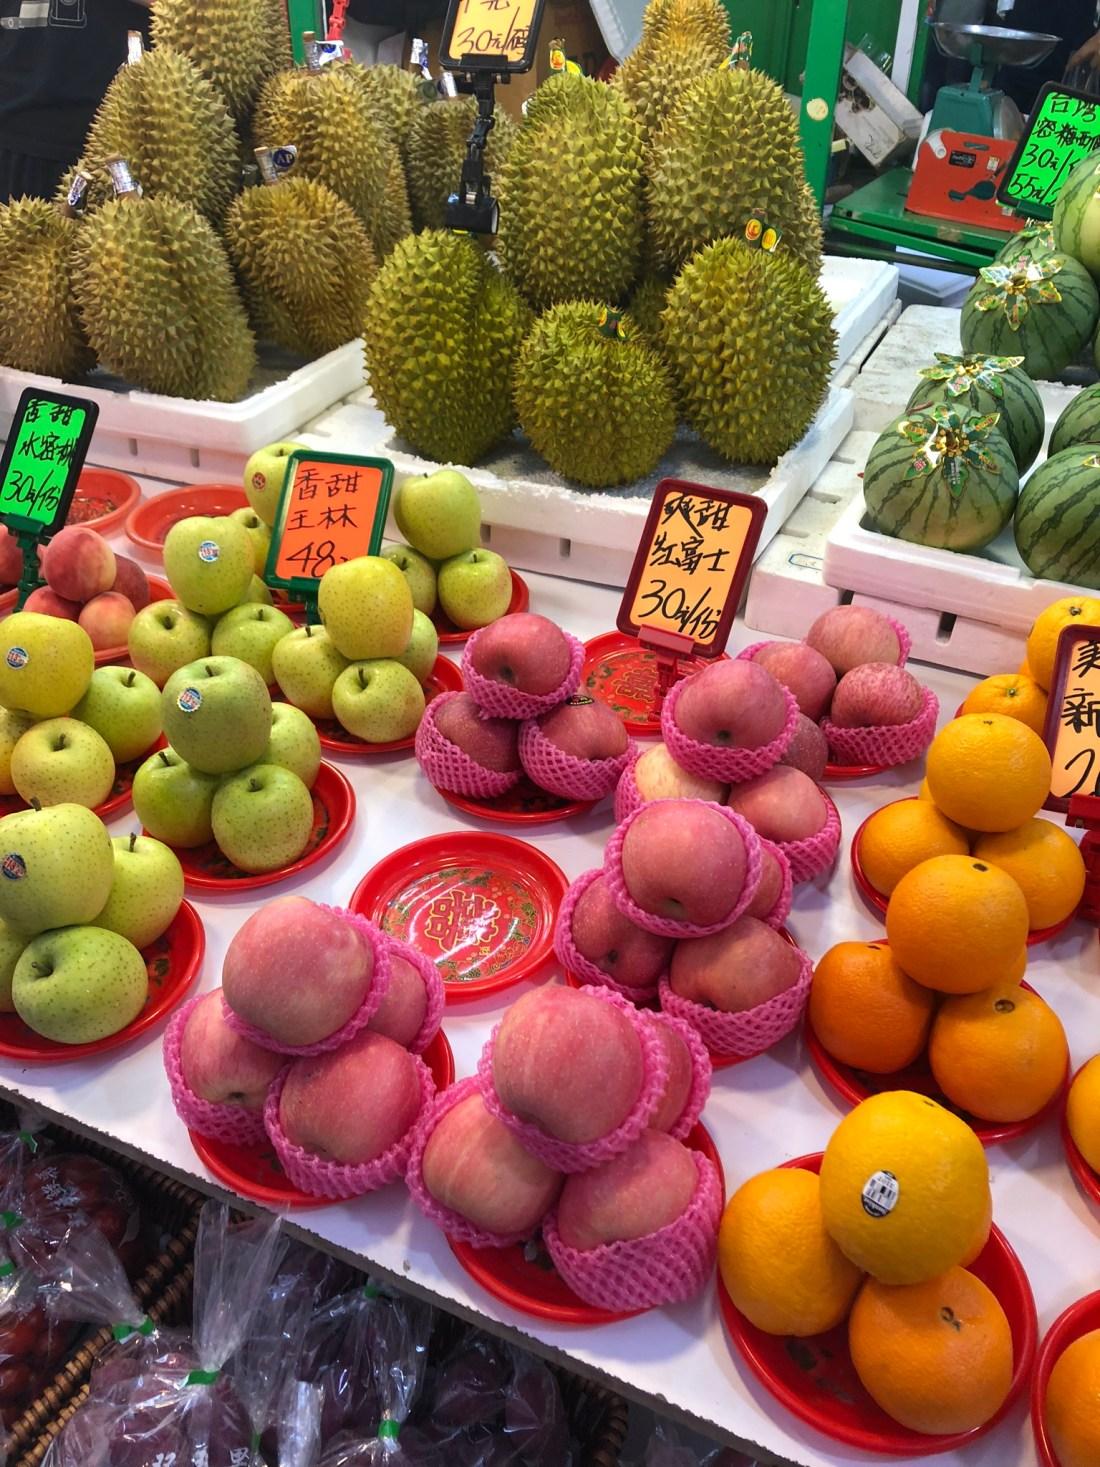 Fruit for sale in Mong Kok, Hong Kong